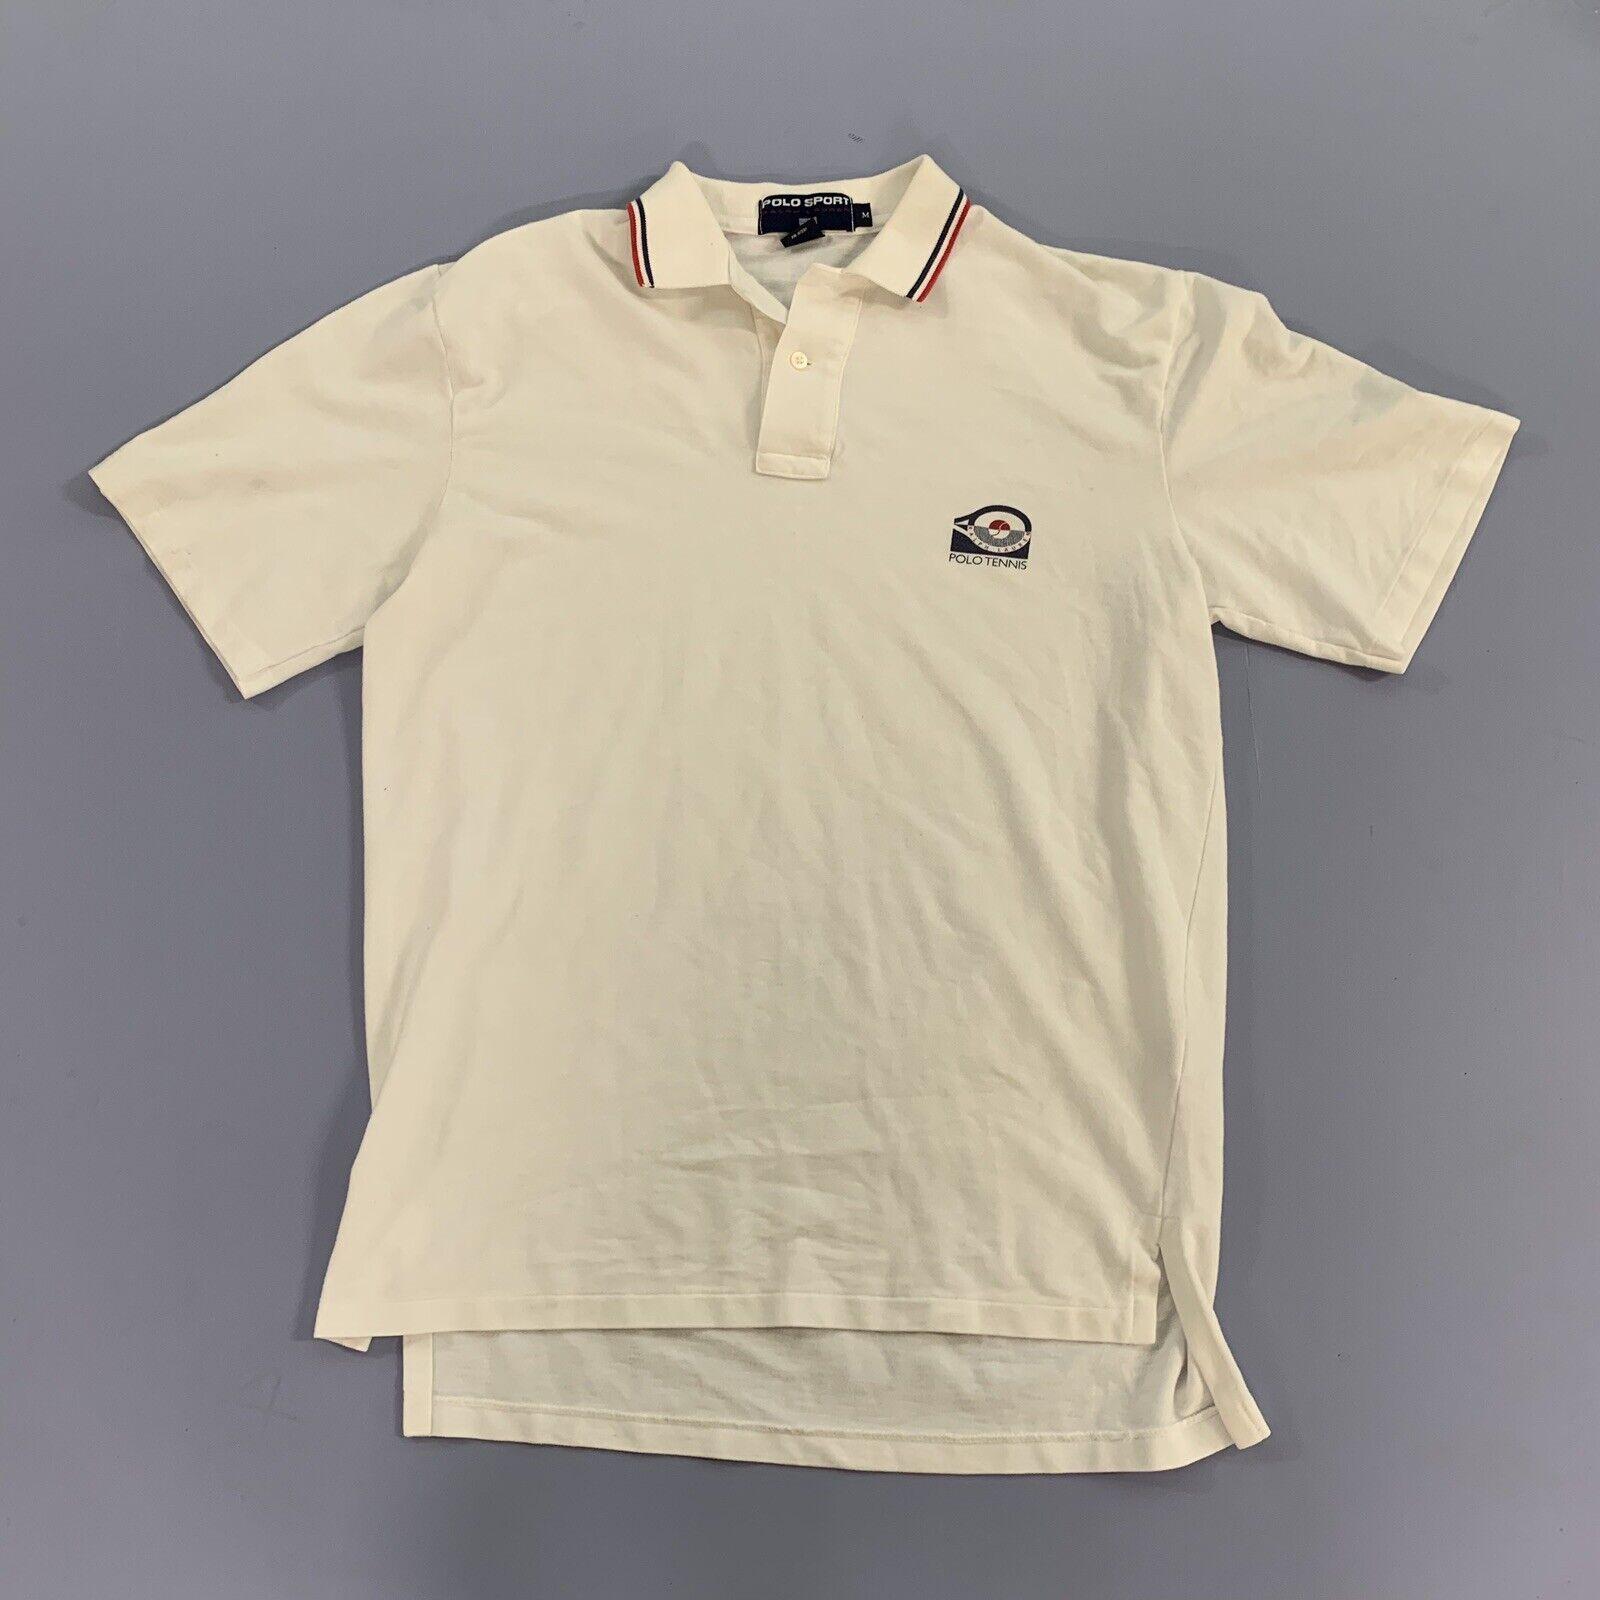 Vtg 80s 90s Polo Sport Tennis Shirt Single Stitch… - image 2